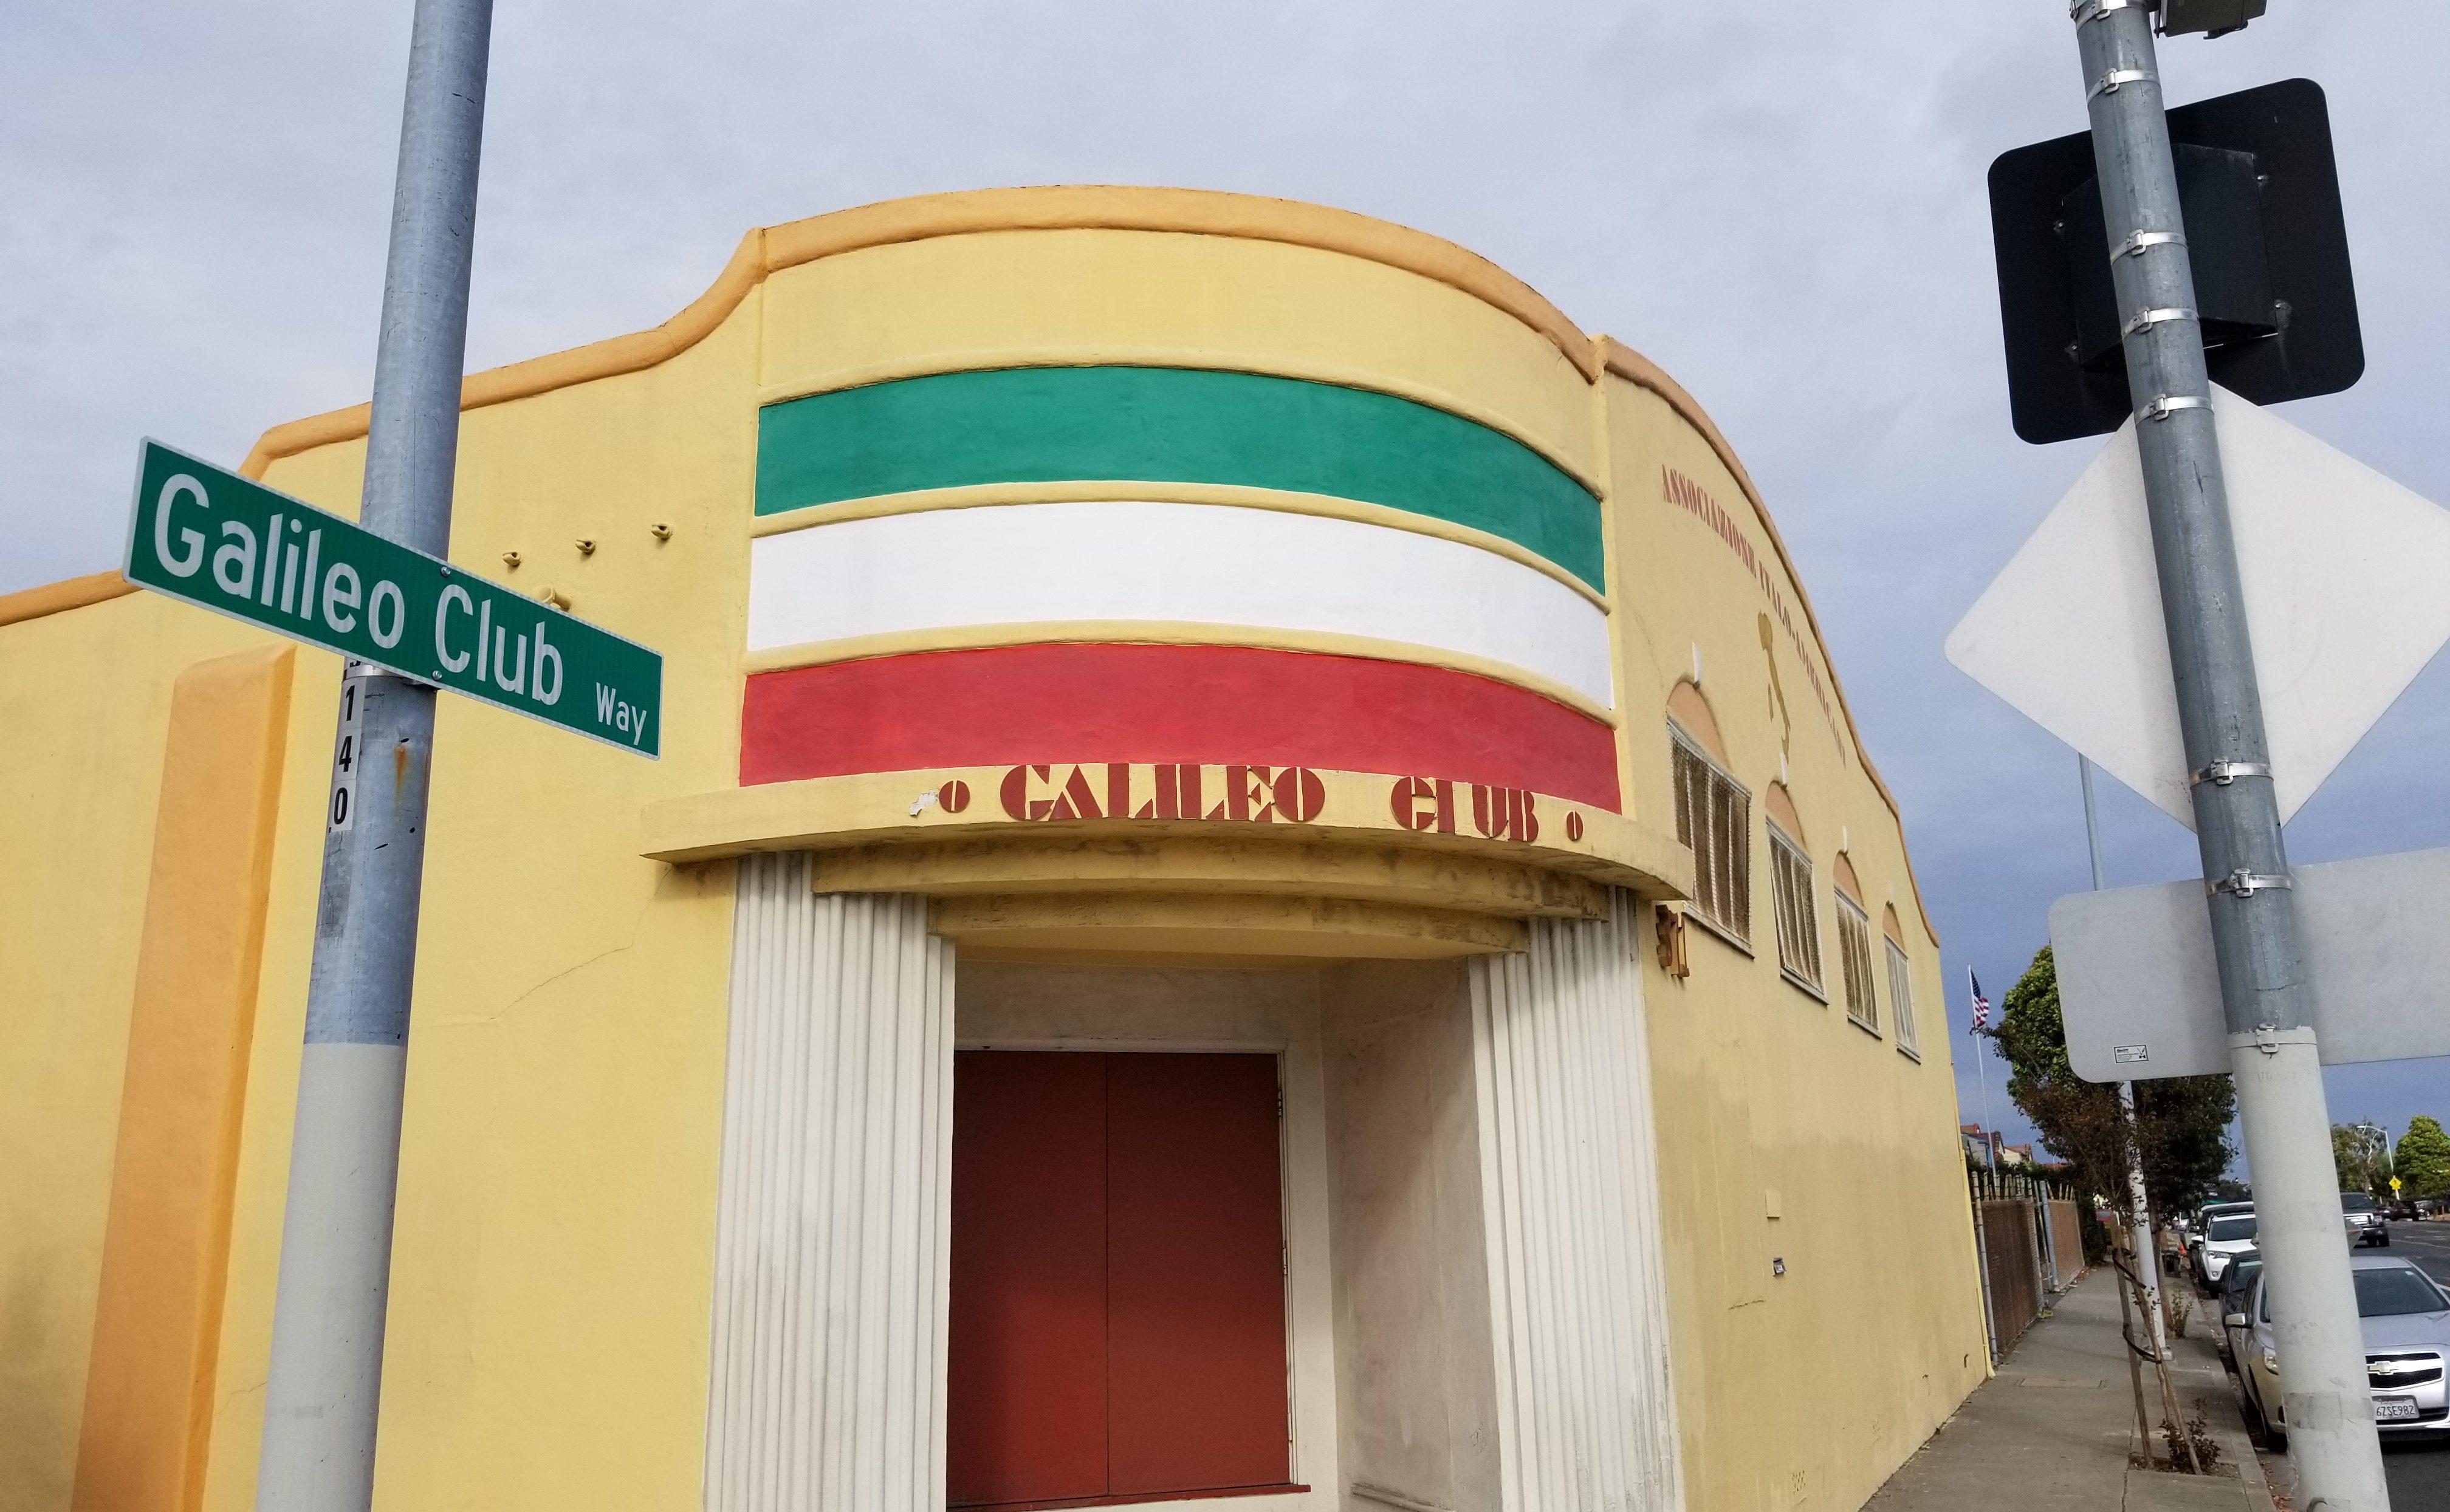 Galileo Club bridges the gap between past and future